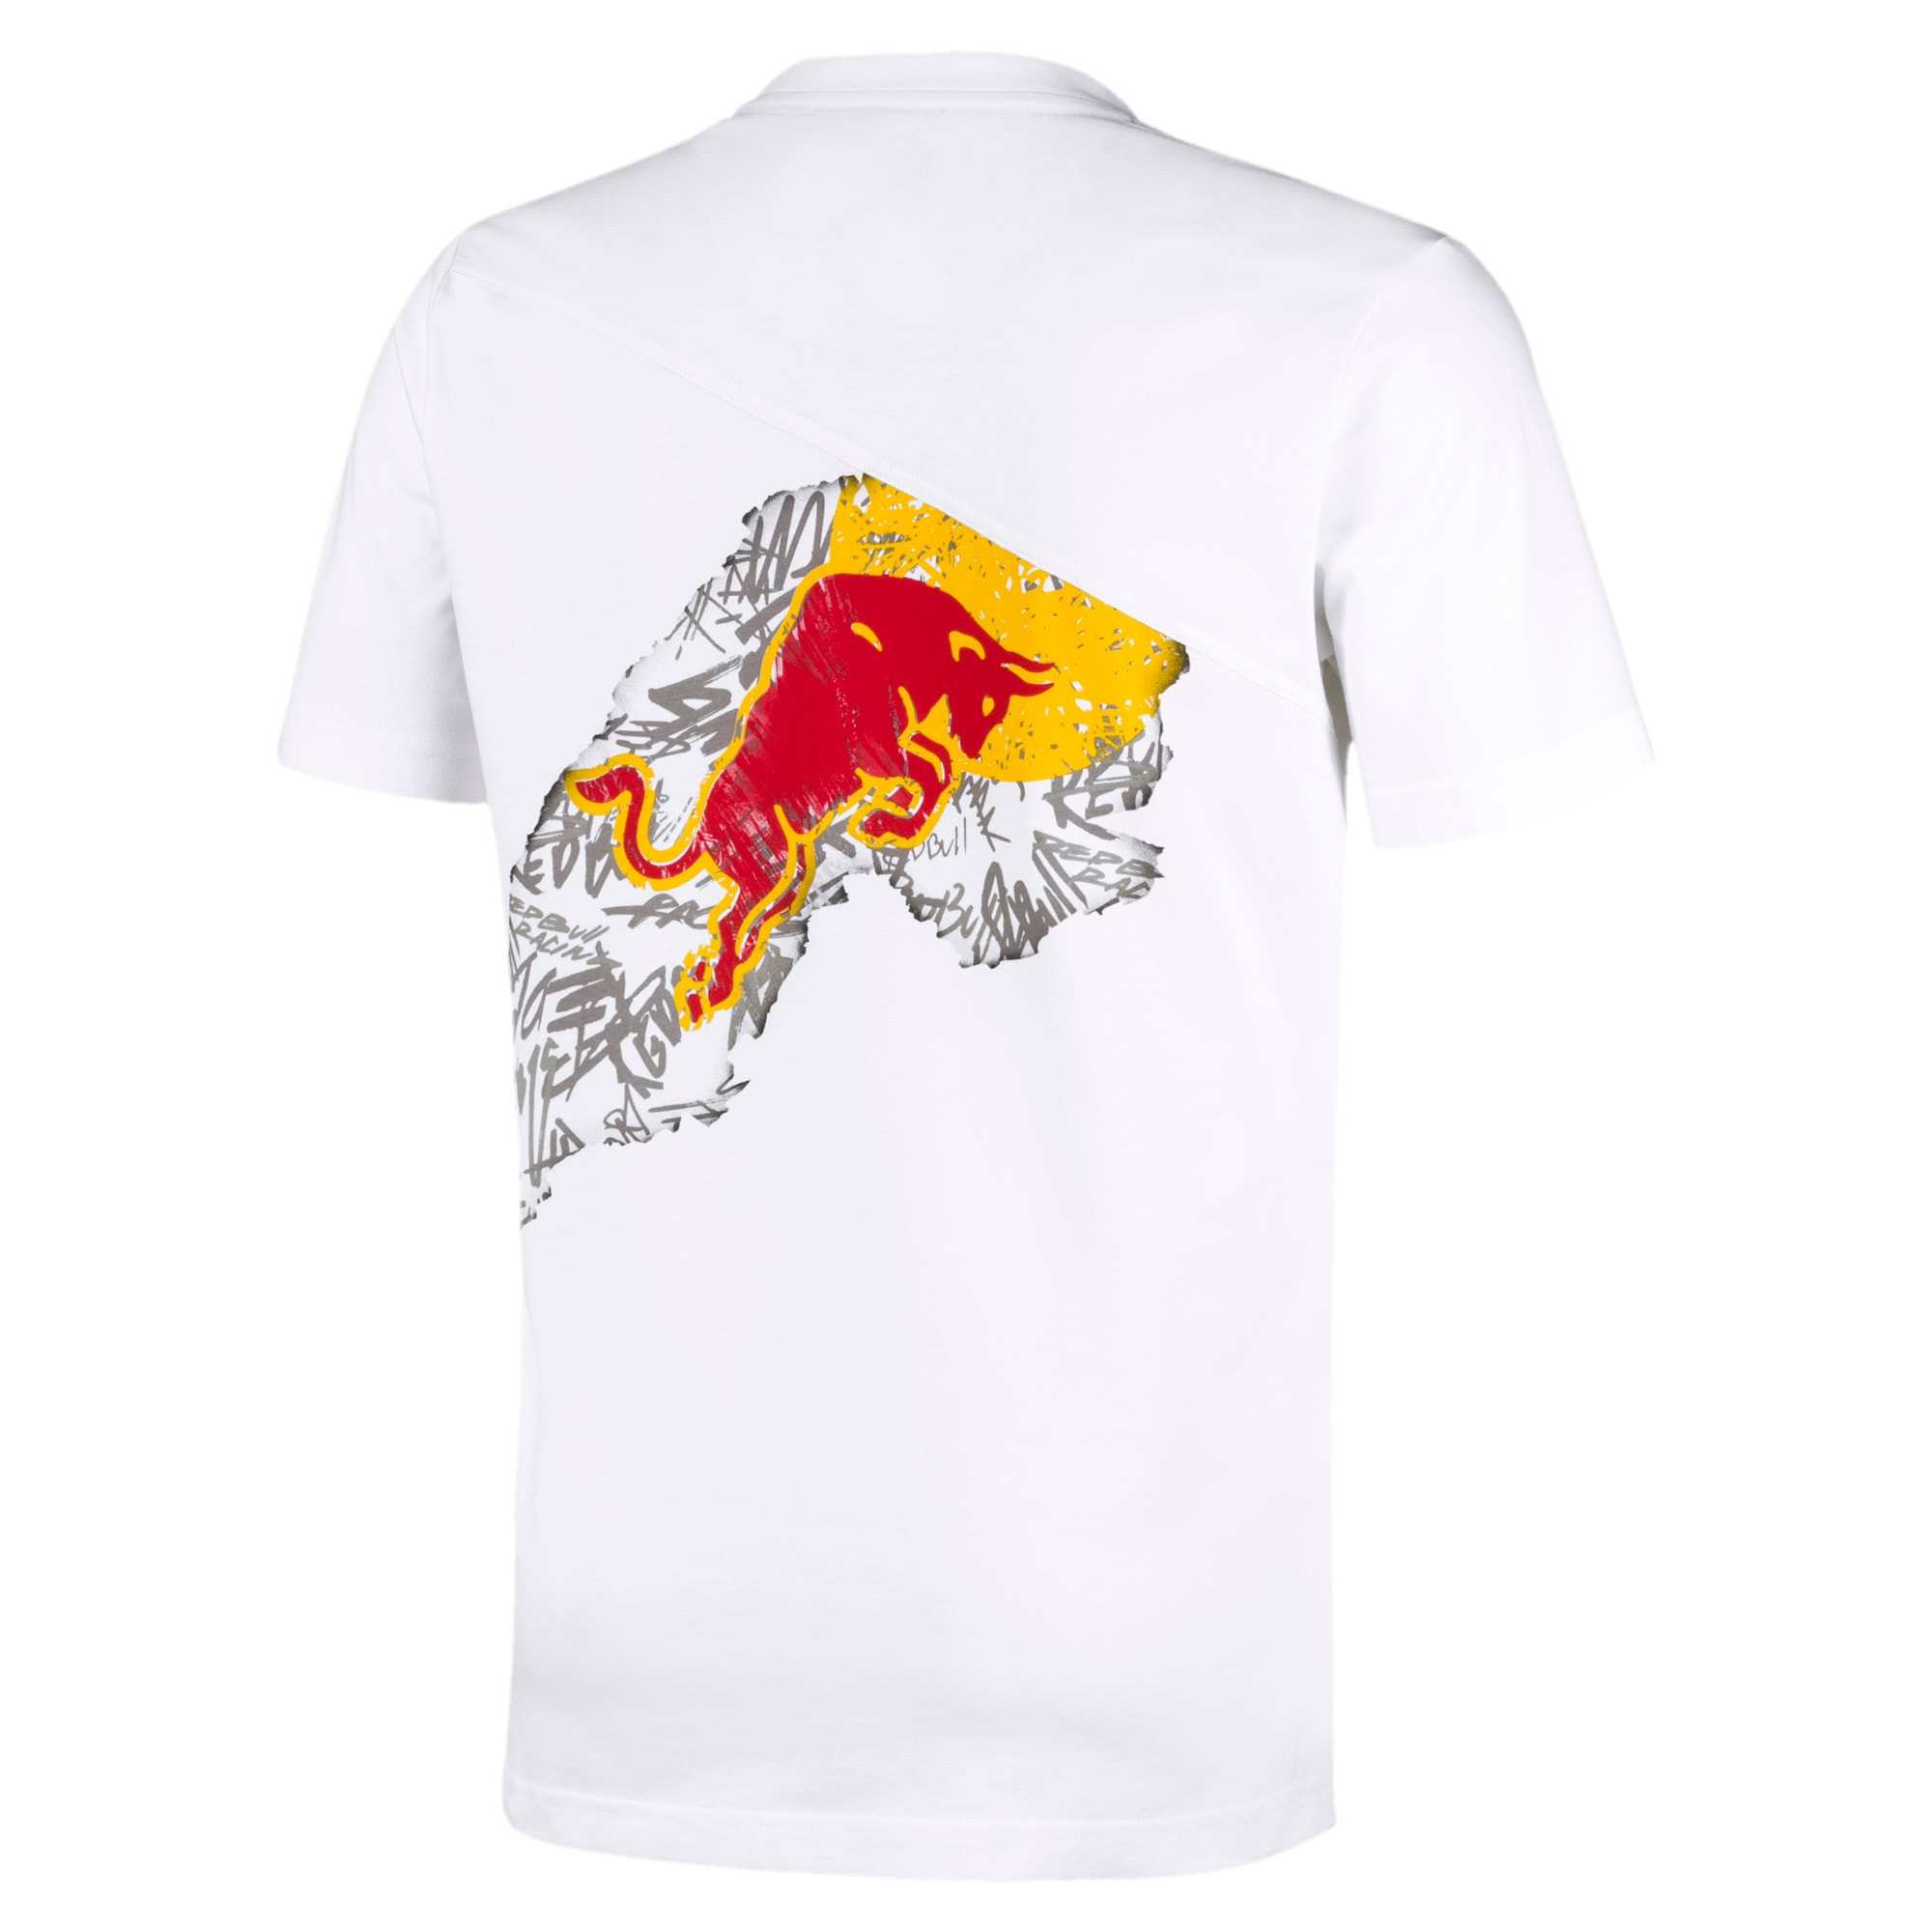 Thumbnail 5 of Maglietta Red Bull Racing Dynamic Bull uomo, Puma White, medium